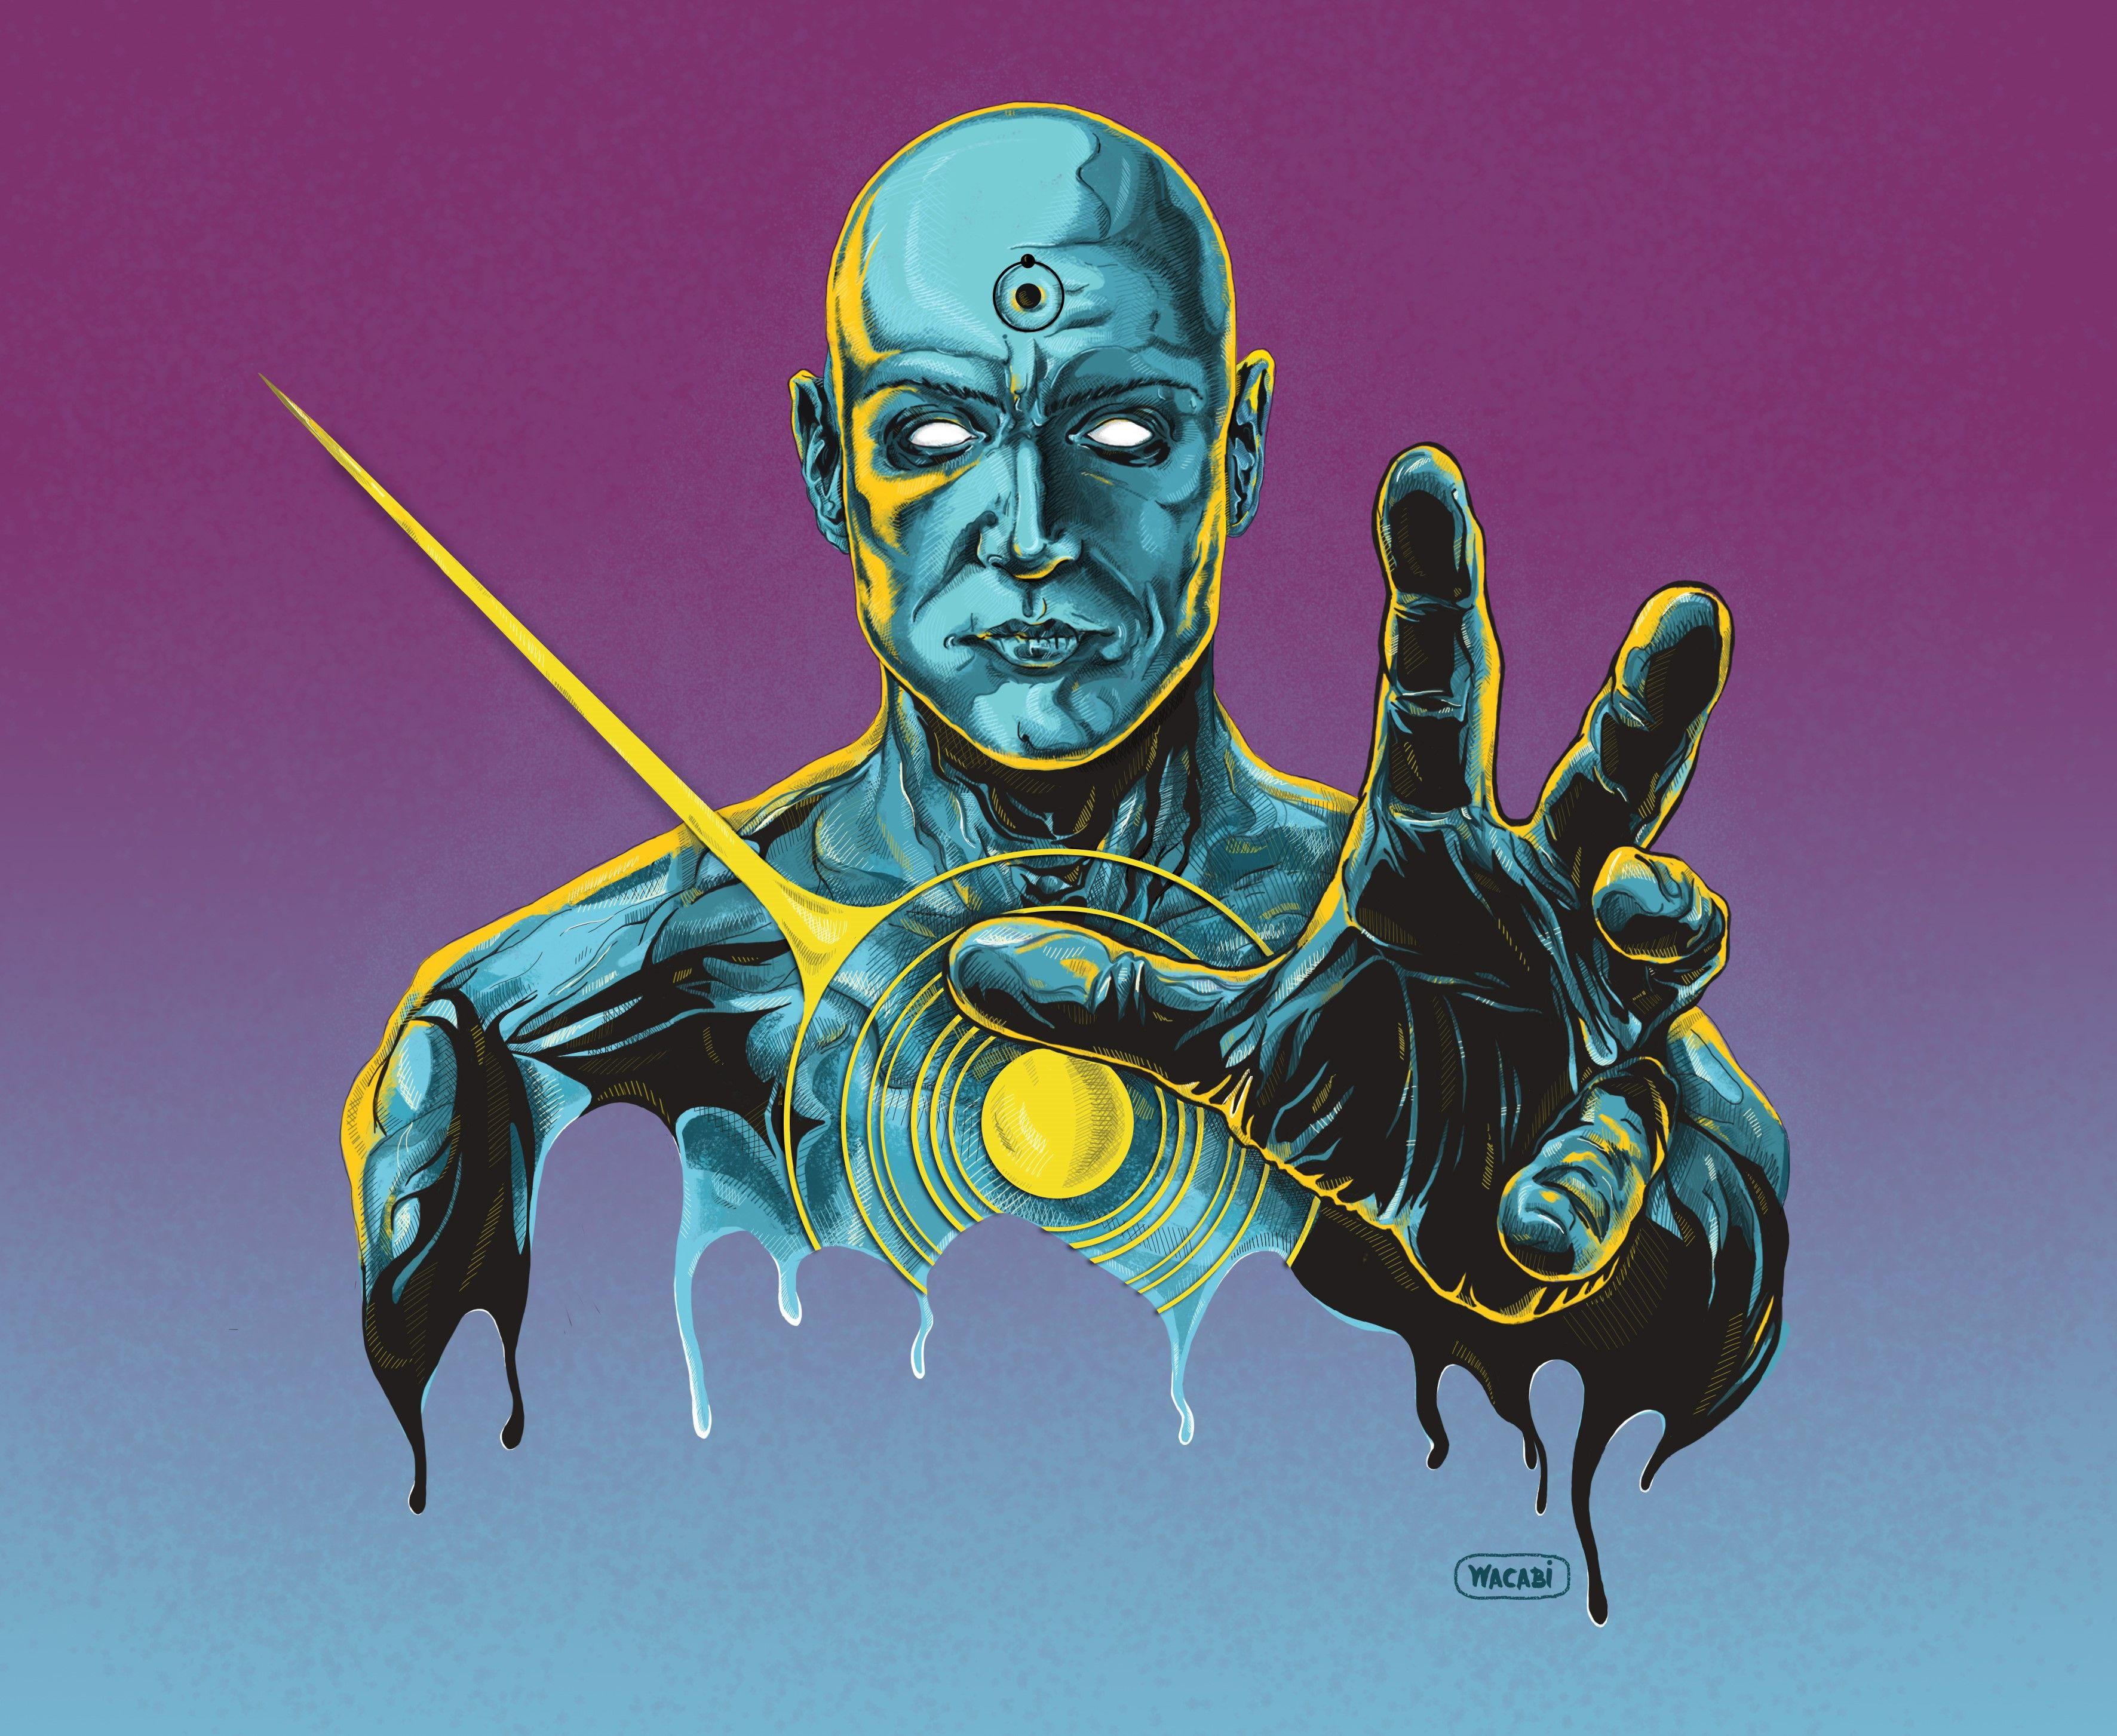 Dr Manhattan Watchmen Superhero Comic Art Superhero Comics Art Comic Art Superhero Wallpaper